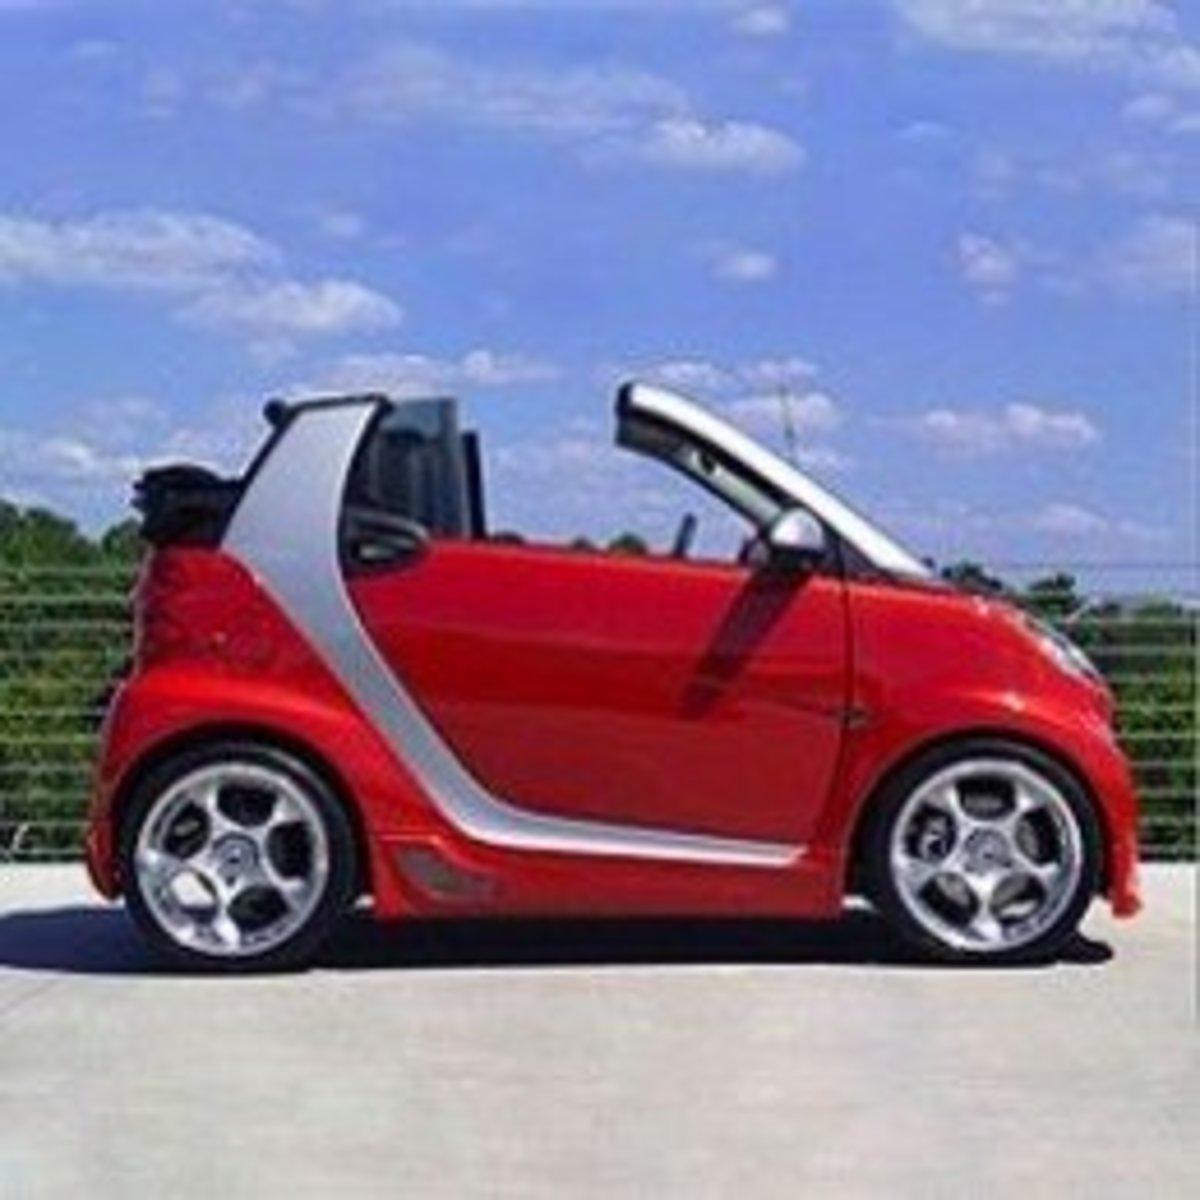 Smart Car Body Kits: Wicked Kuhl Body Kits and Mods